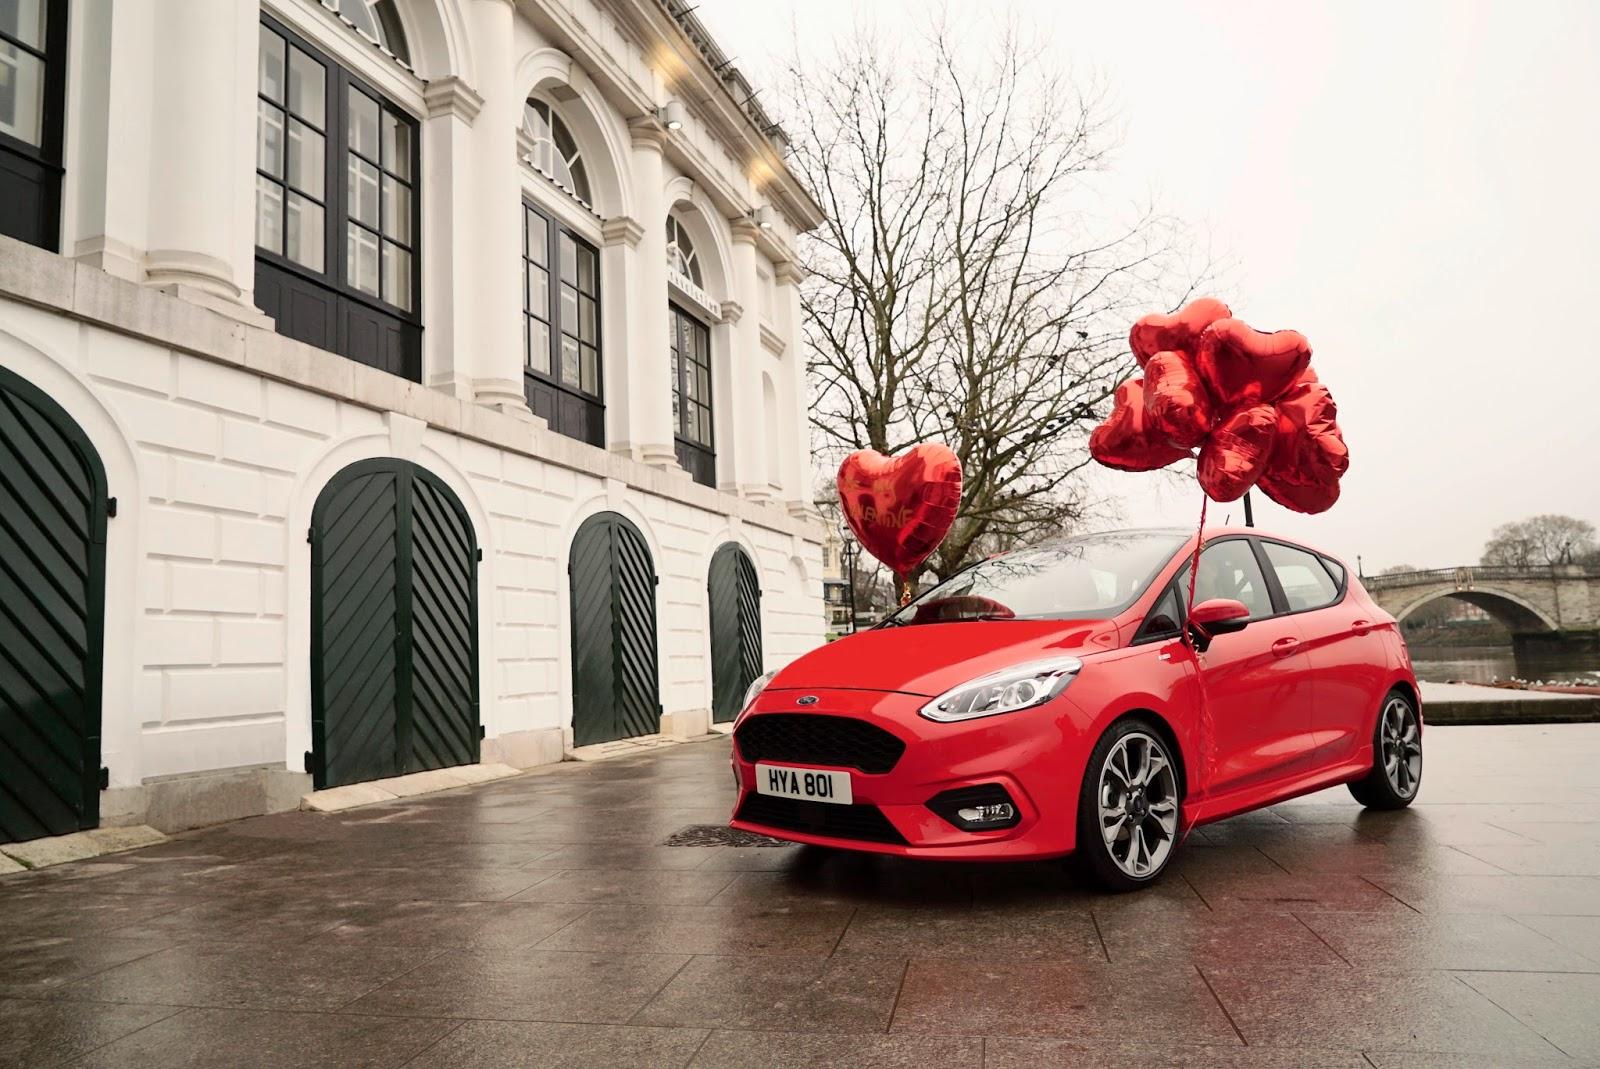 valentine Και οι εργαζόμενοι έχουν ψυχή, την ημέρα του Αγίου Βαλεντίνου Ford, Ford Fiesta, Fun, videos